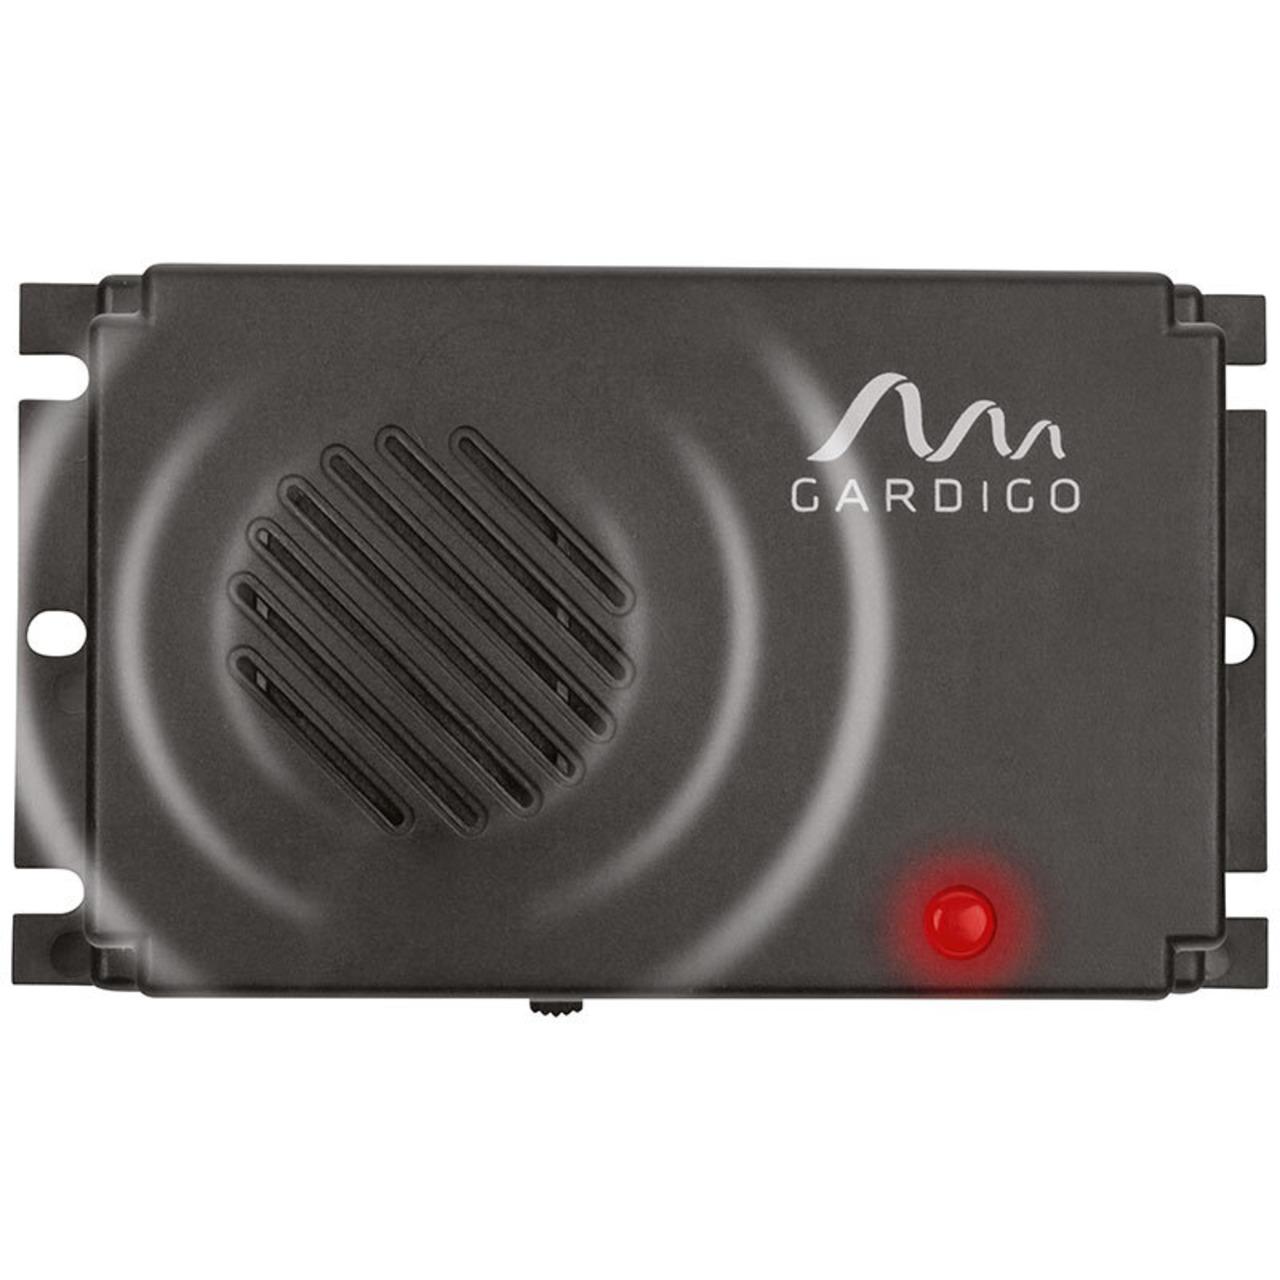 Gardigo Marder-frei mobil inkl- Batterien